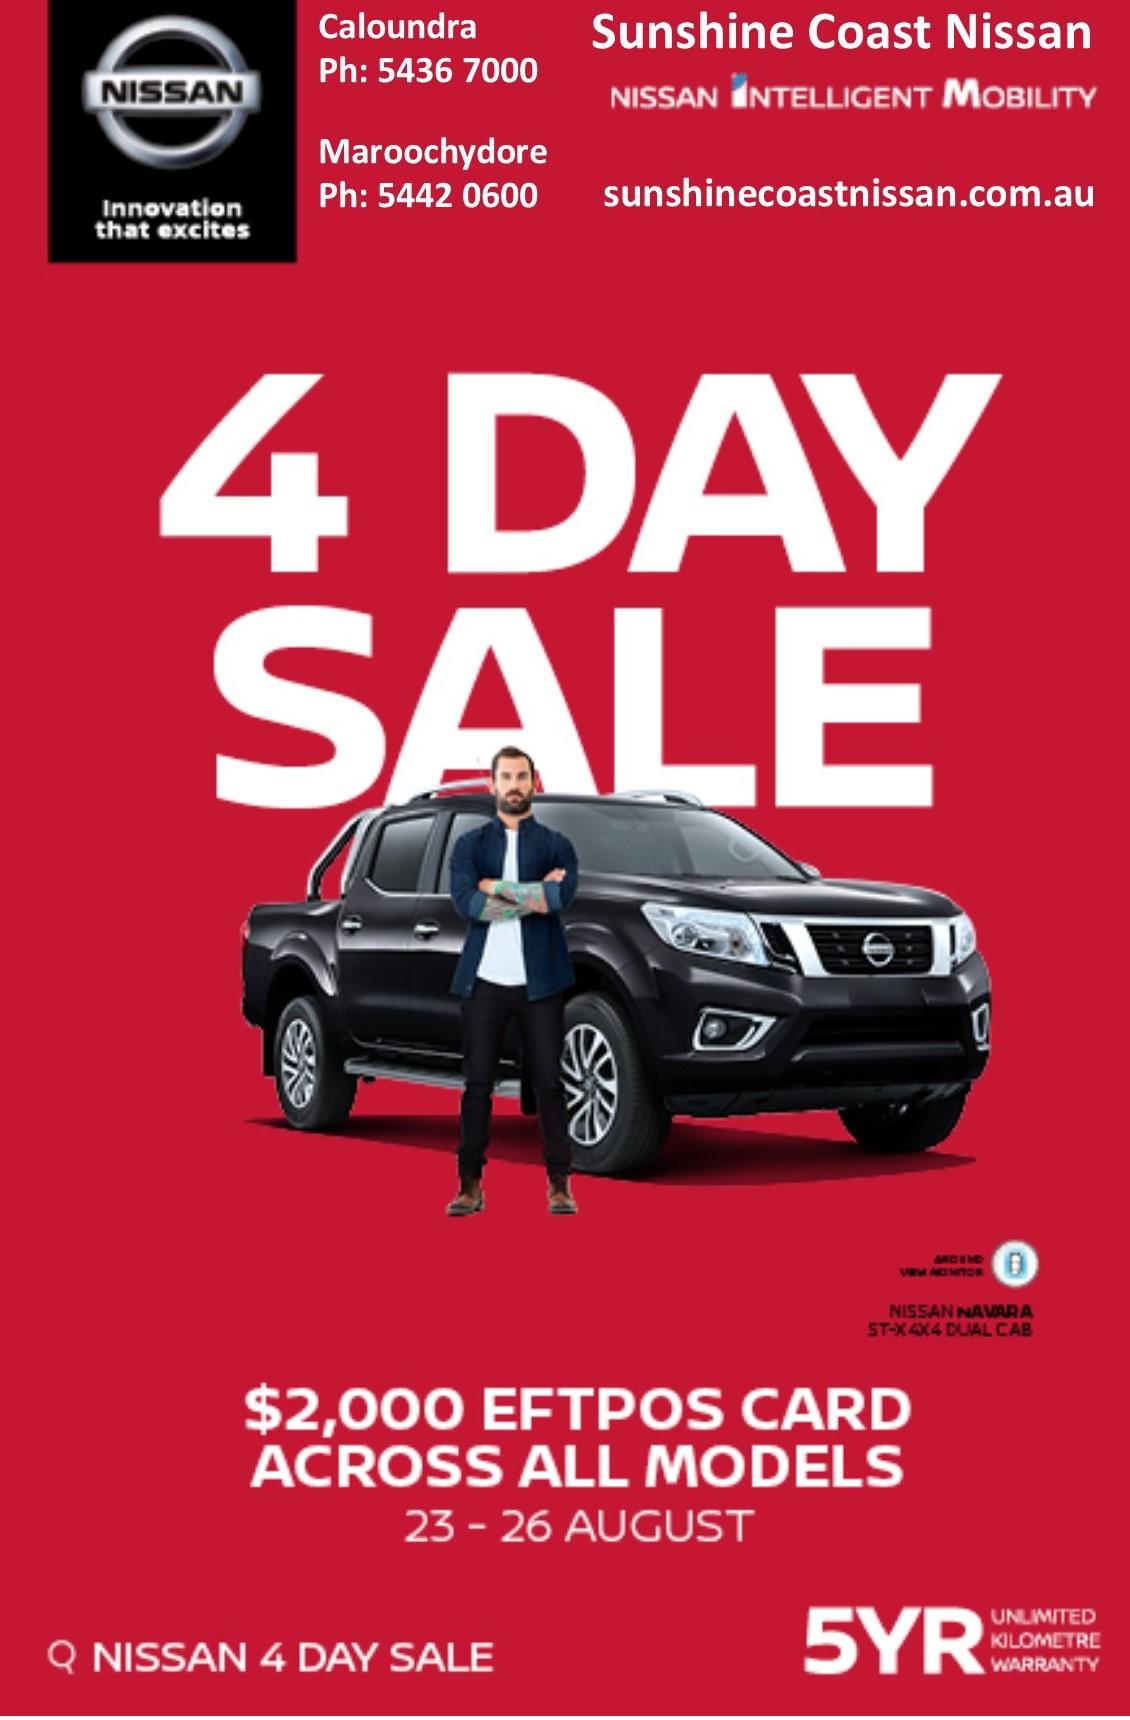 Sunshine Coast Nissan - 4 Day Sale August 23 - 26